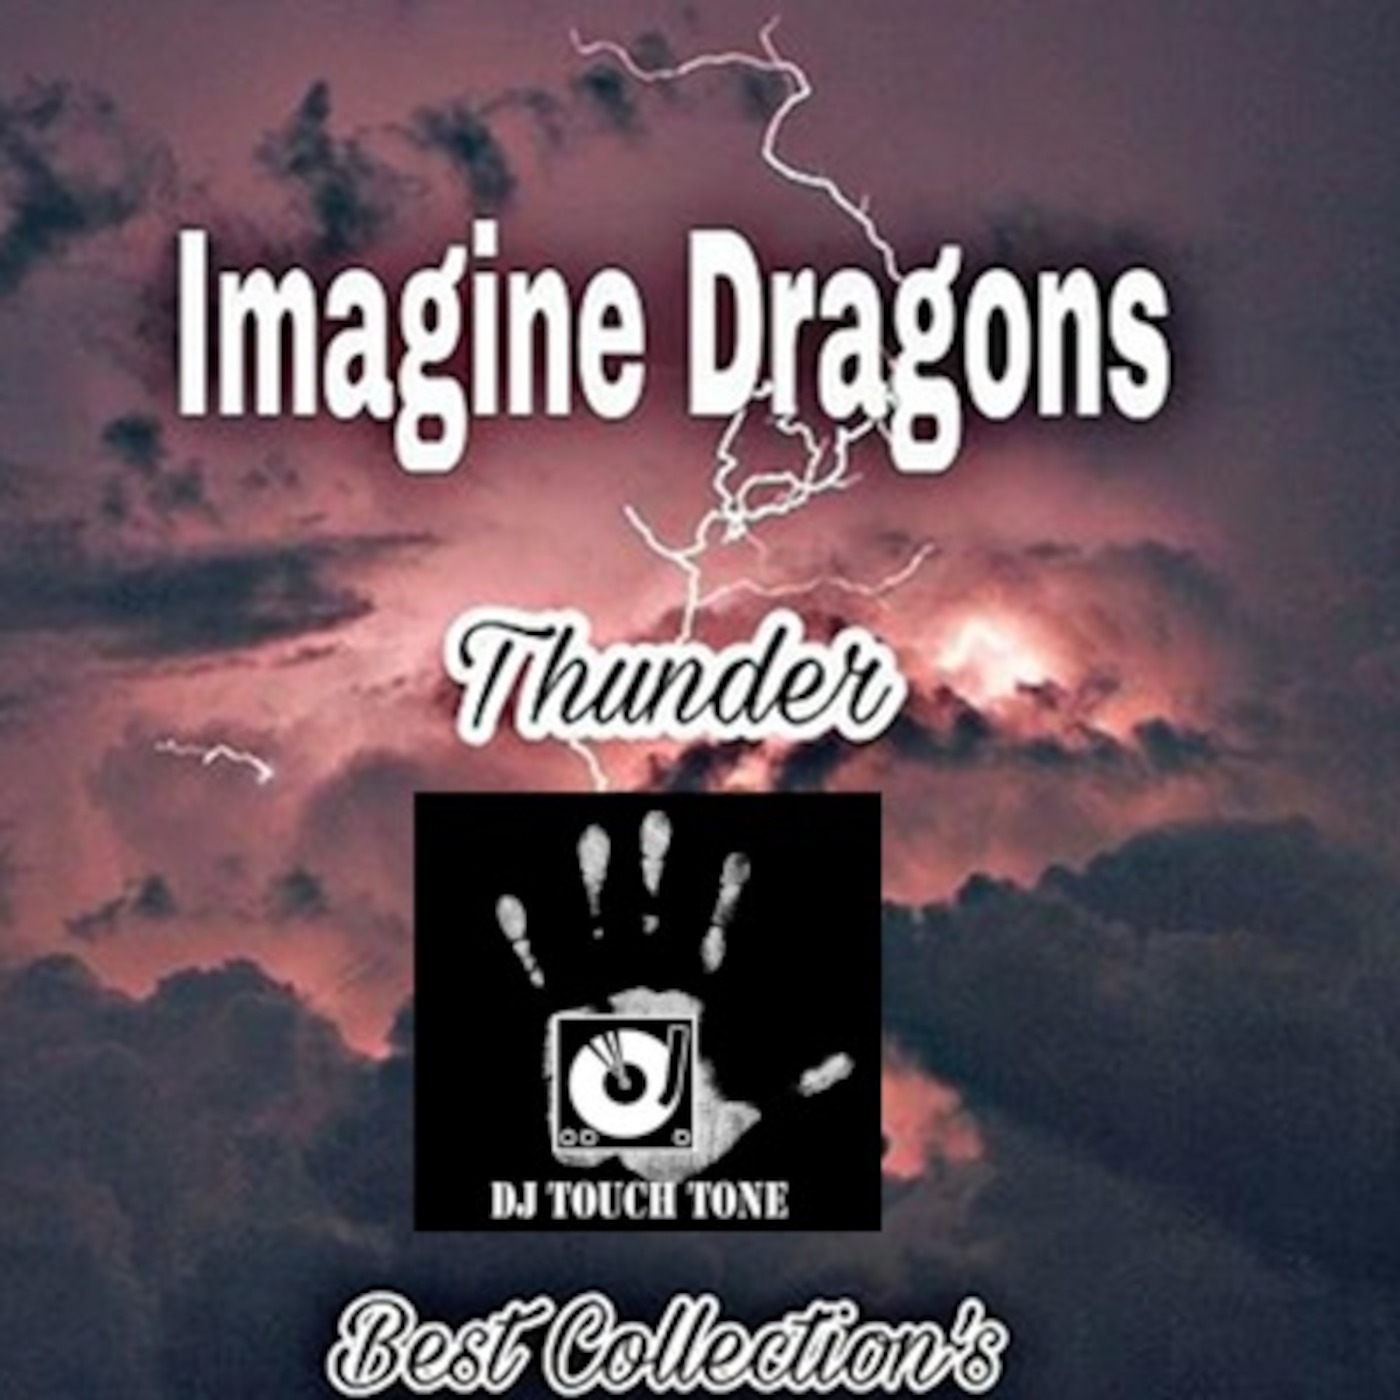 Imagine Dragons Thunder: DJ TOUCH TONE MUSIC BLOG